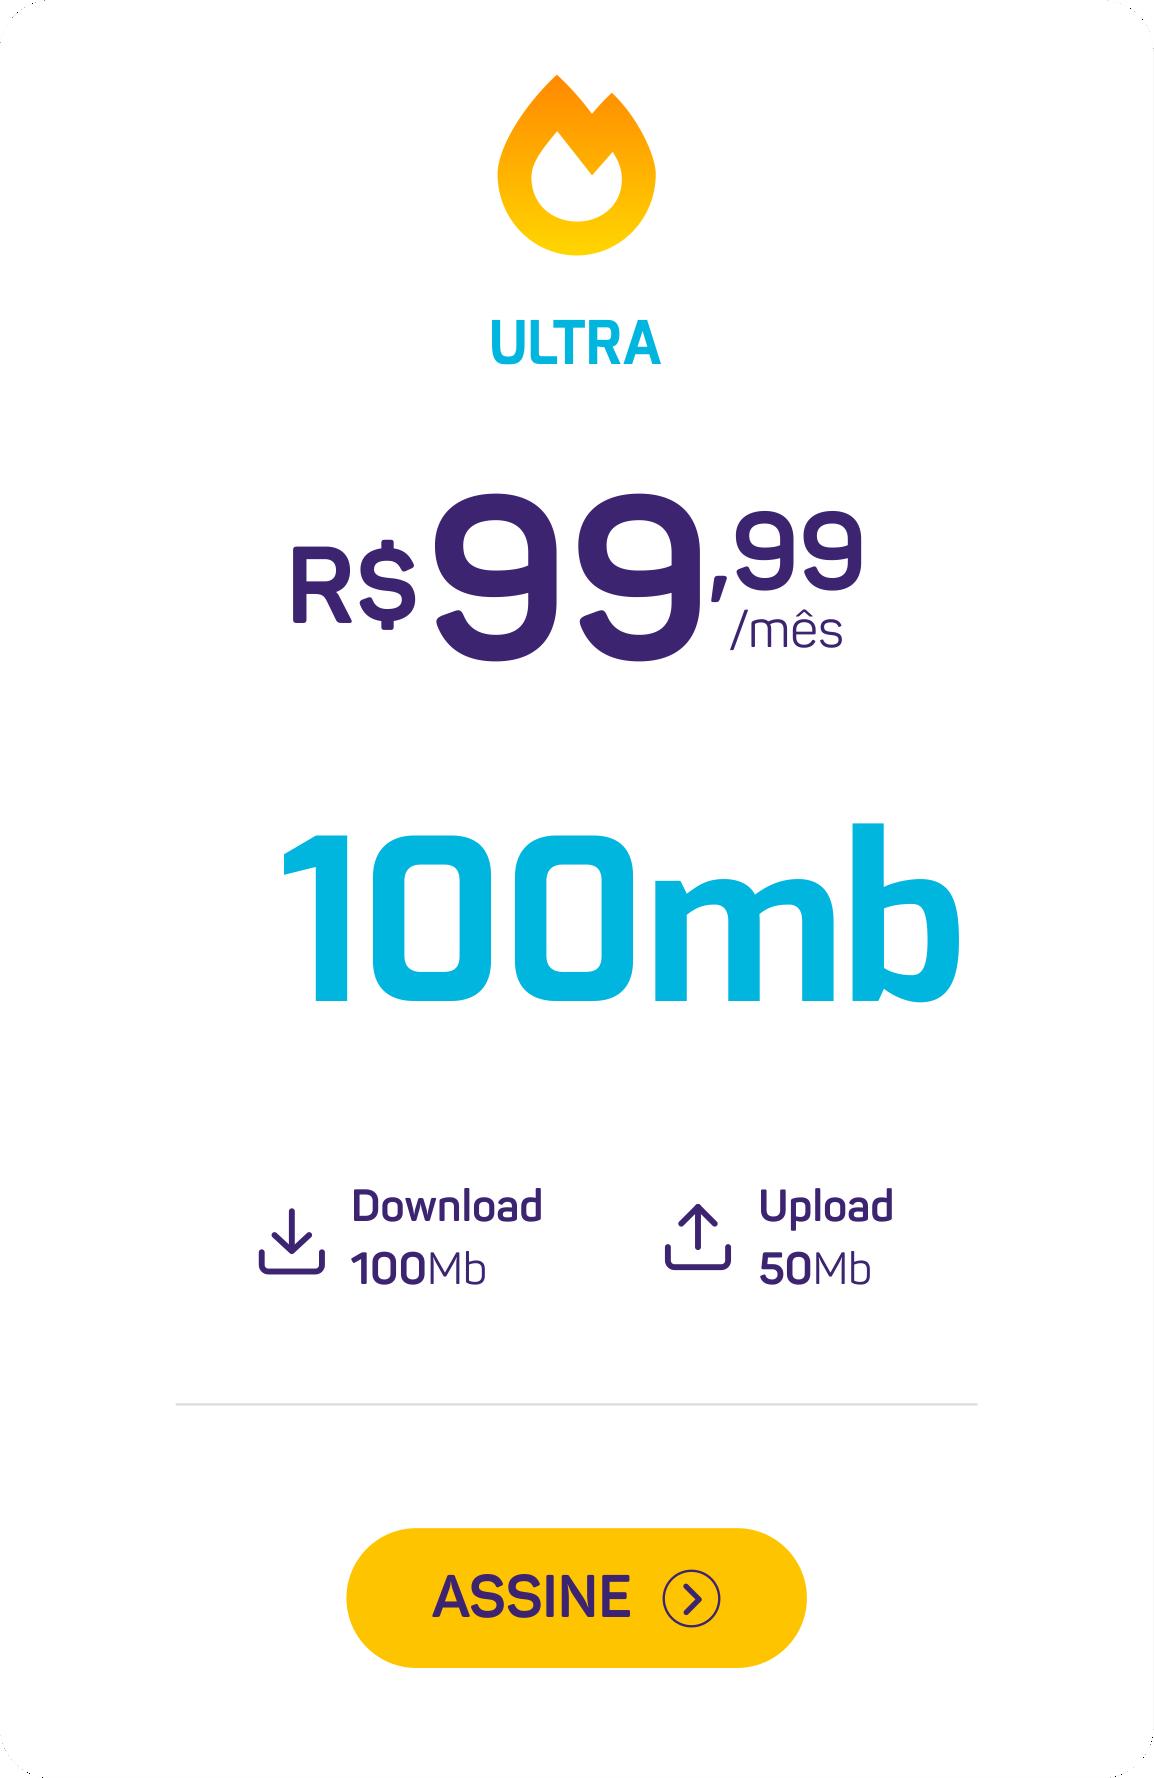 Nova Olinda Residencial Ultra100mb